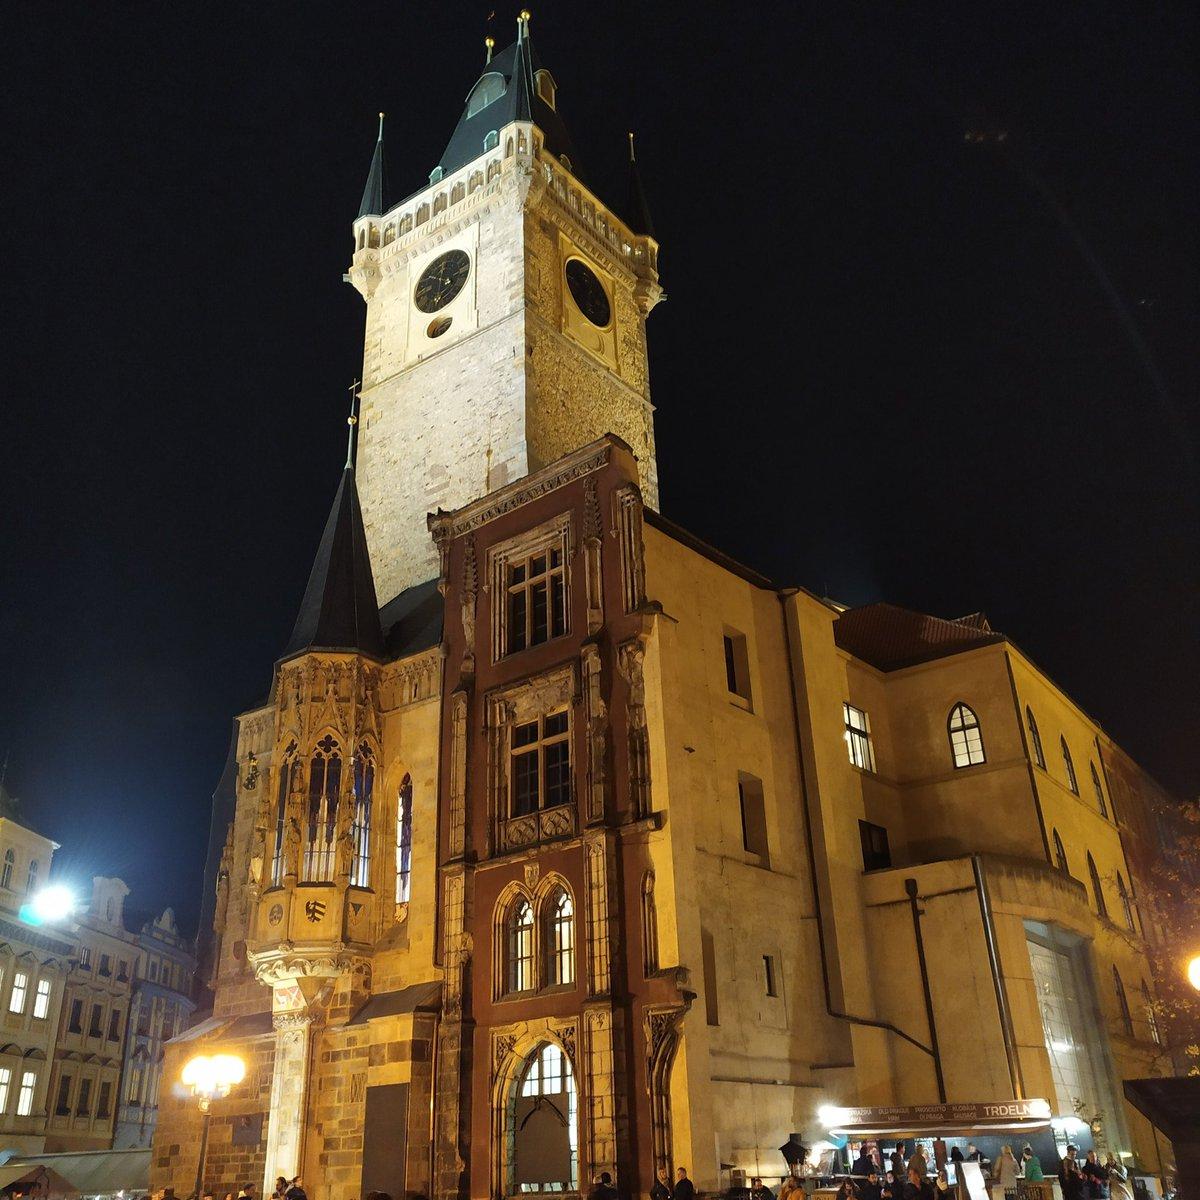 Old Town Hall in #Prague http://bit.ly/praguetour #Bachelor #single #women #travelblogger #TravelTuesday #TuesdayThoughts #tuesdayMotivation #TuesdayMorning #tuesdayvibes #WednesdayWisdom #WednesdayMotivation #ThursdayThoughts #FridayFeeling #FridayMotivation